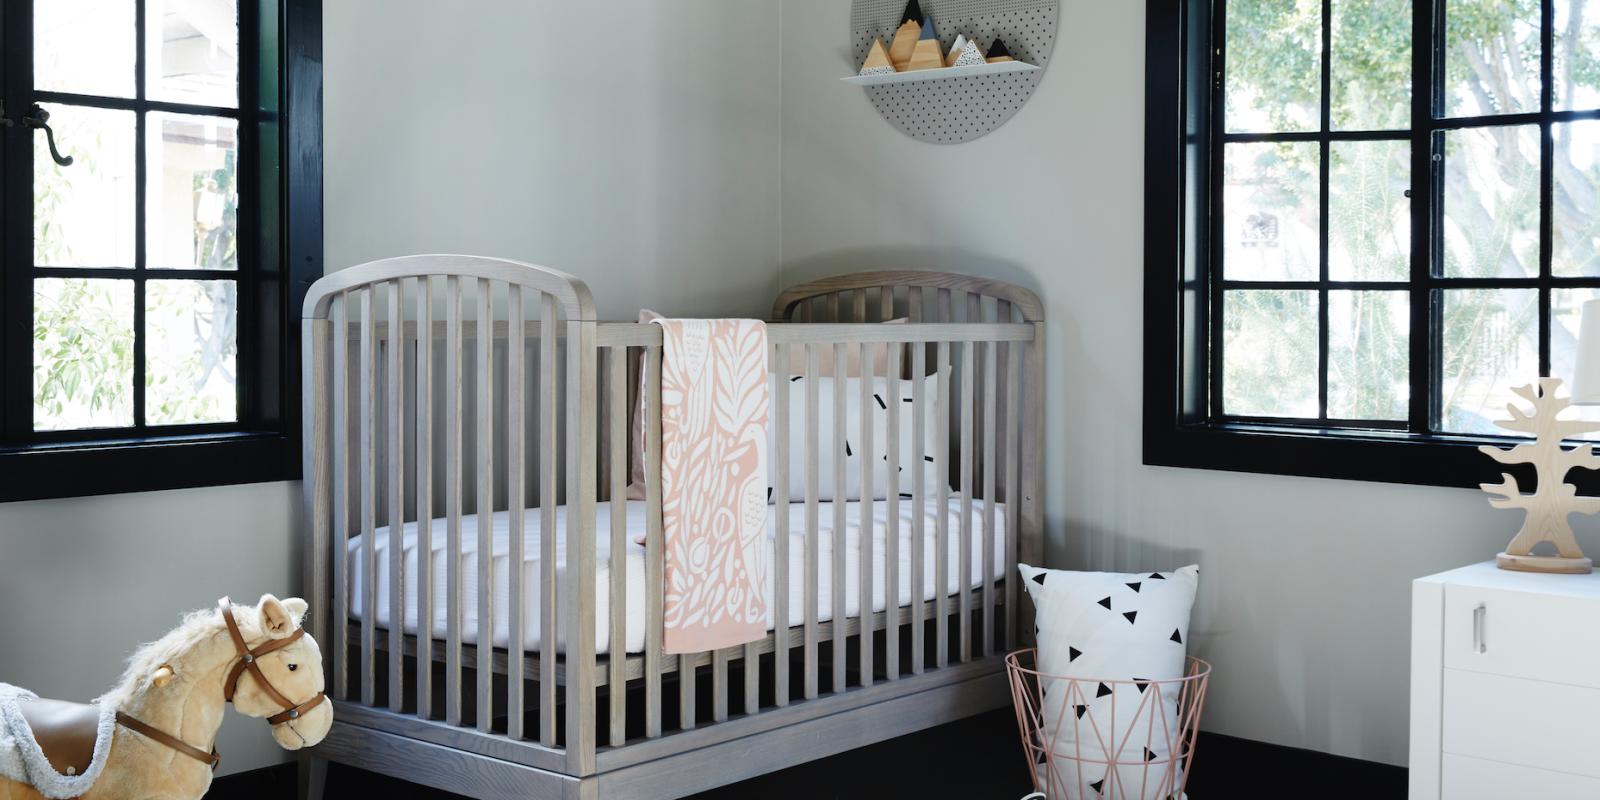 7 cute baby girl rooms nursery decorating ideas for baby girls rh elledecor com